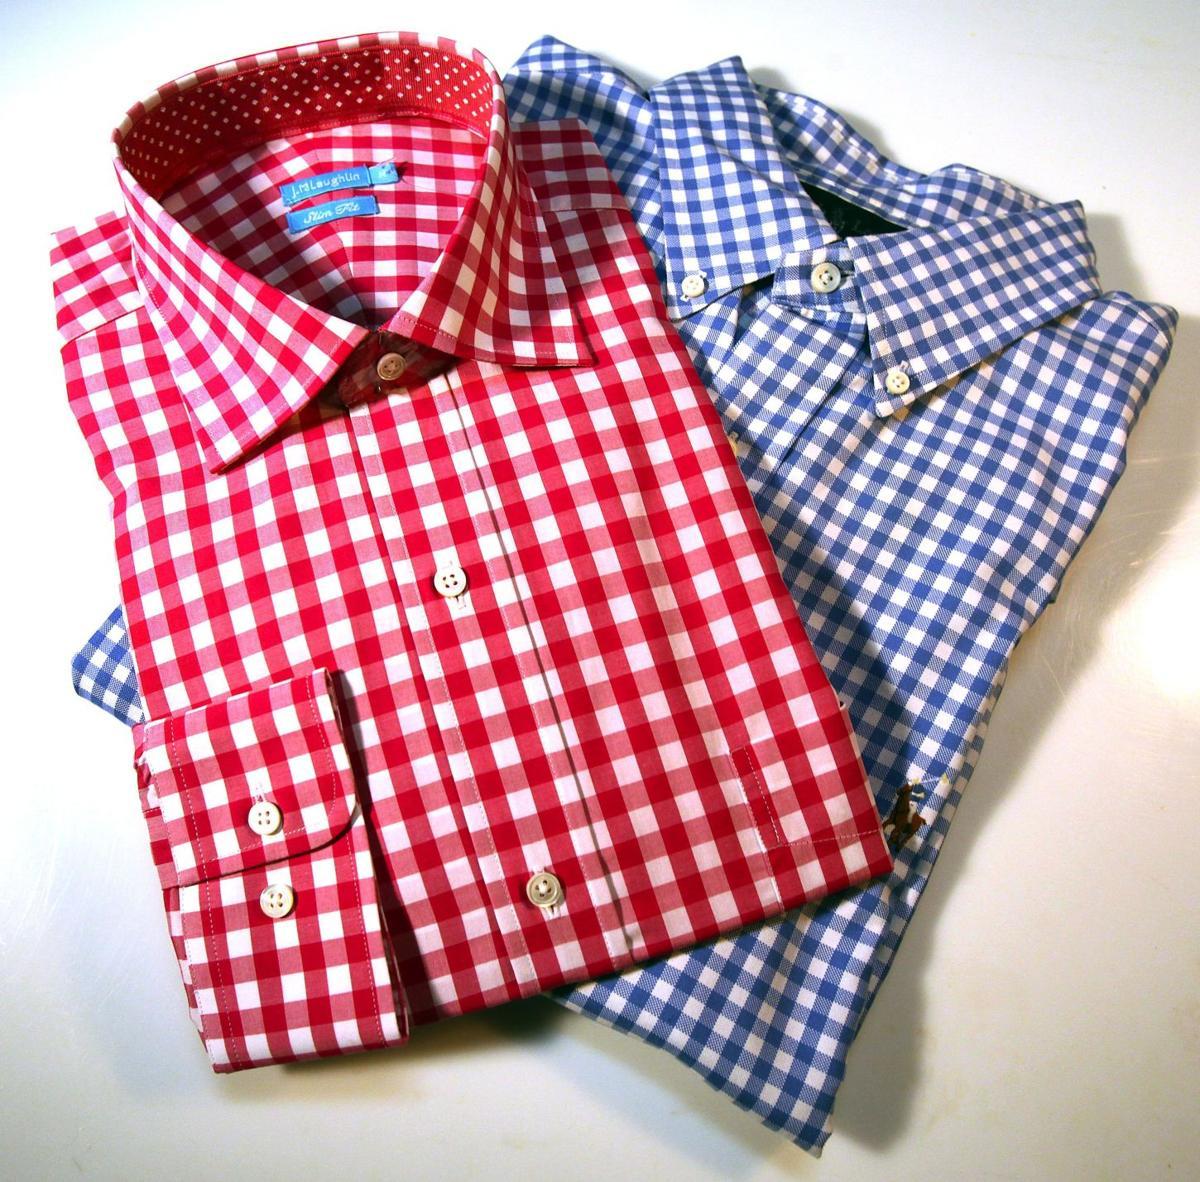 Men's Fashion: Gingham